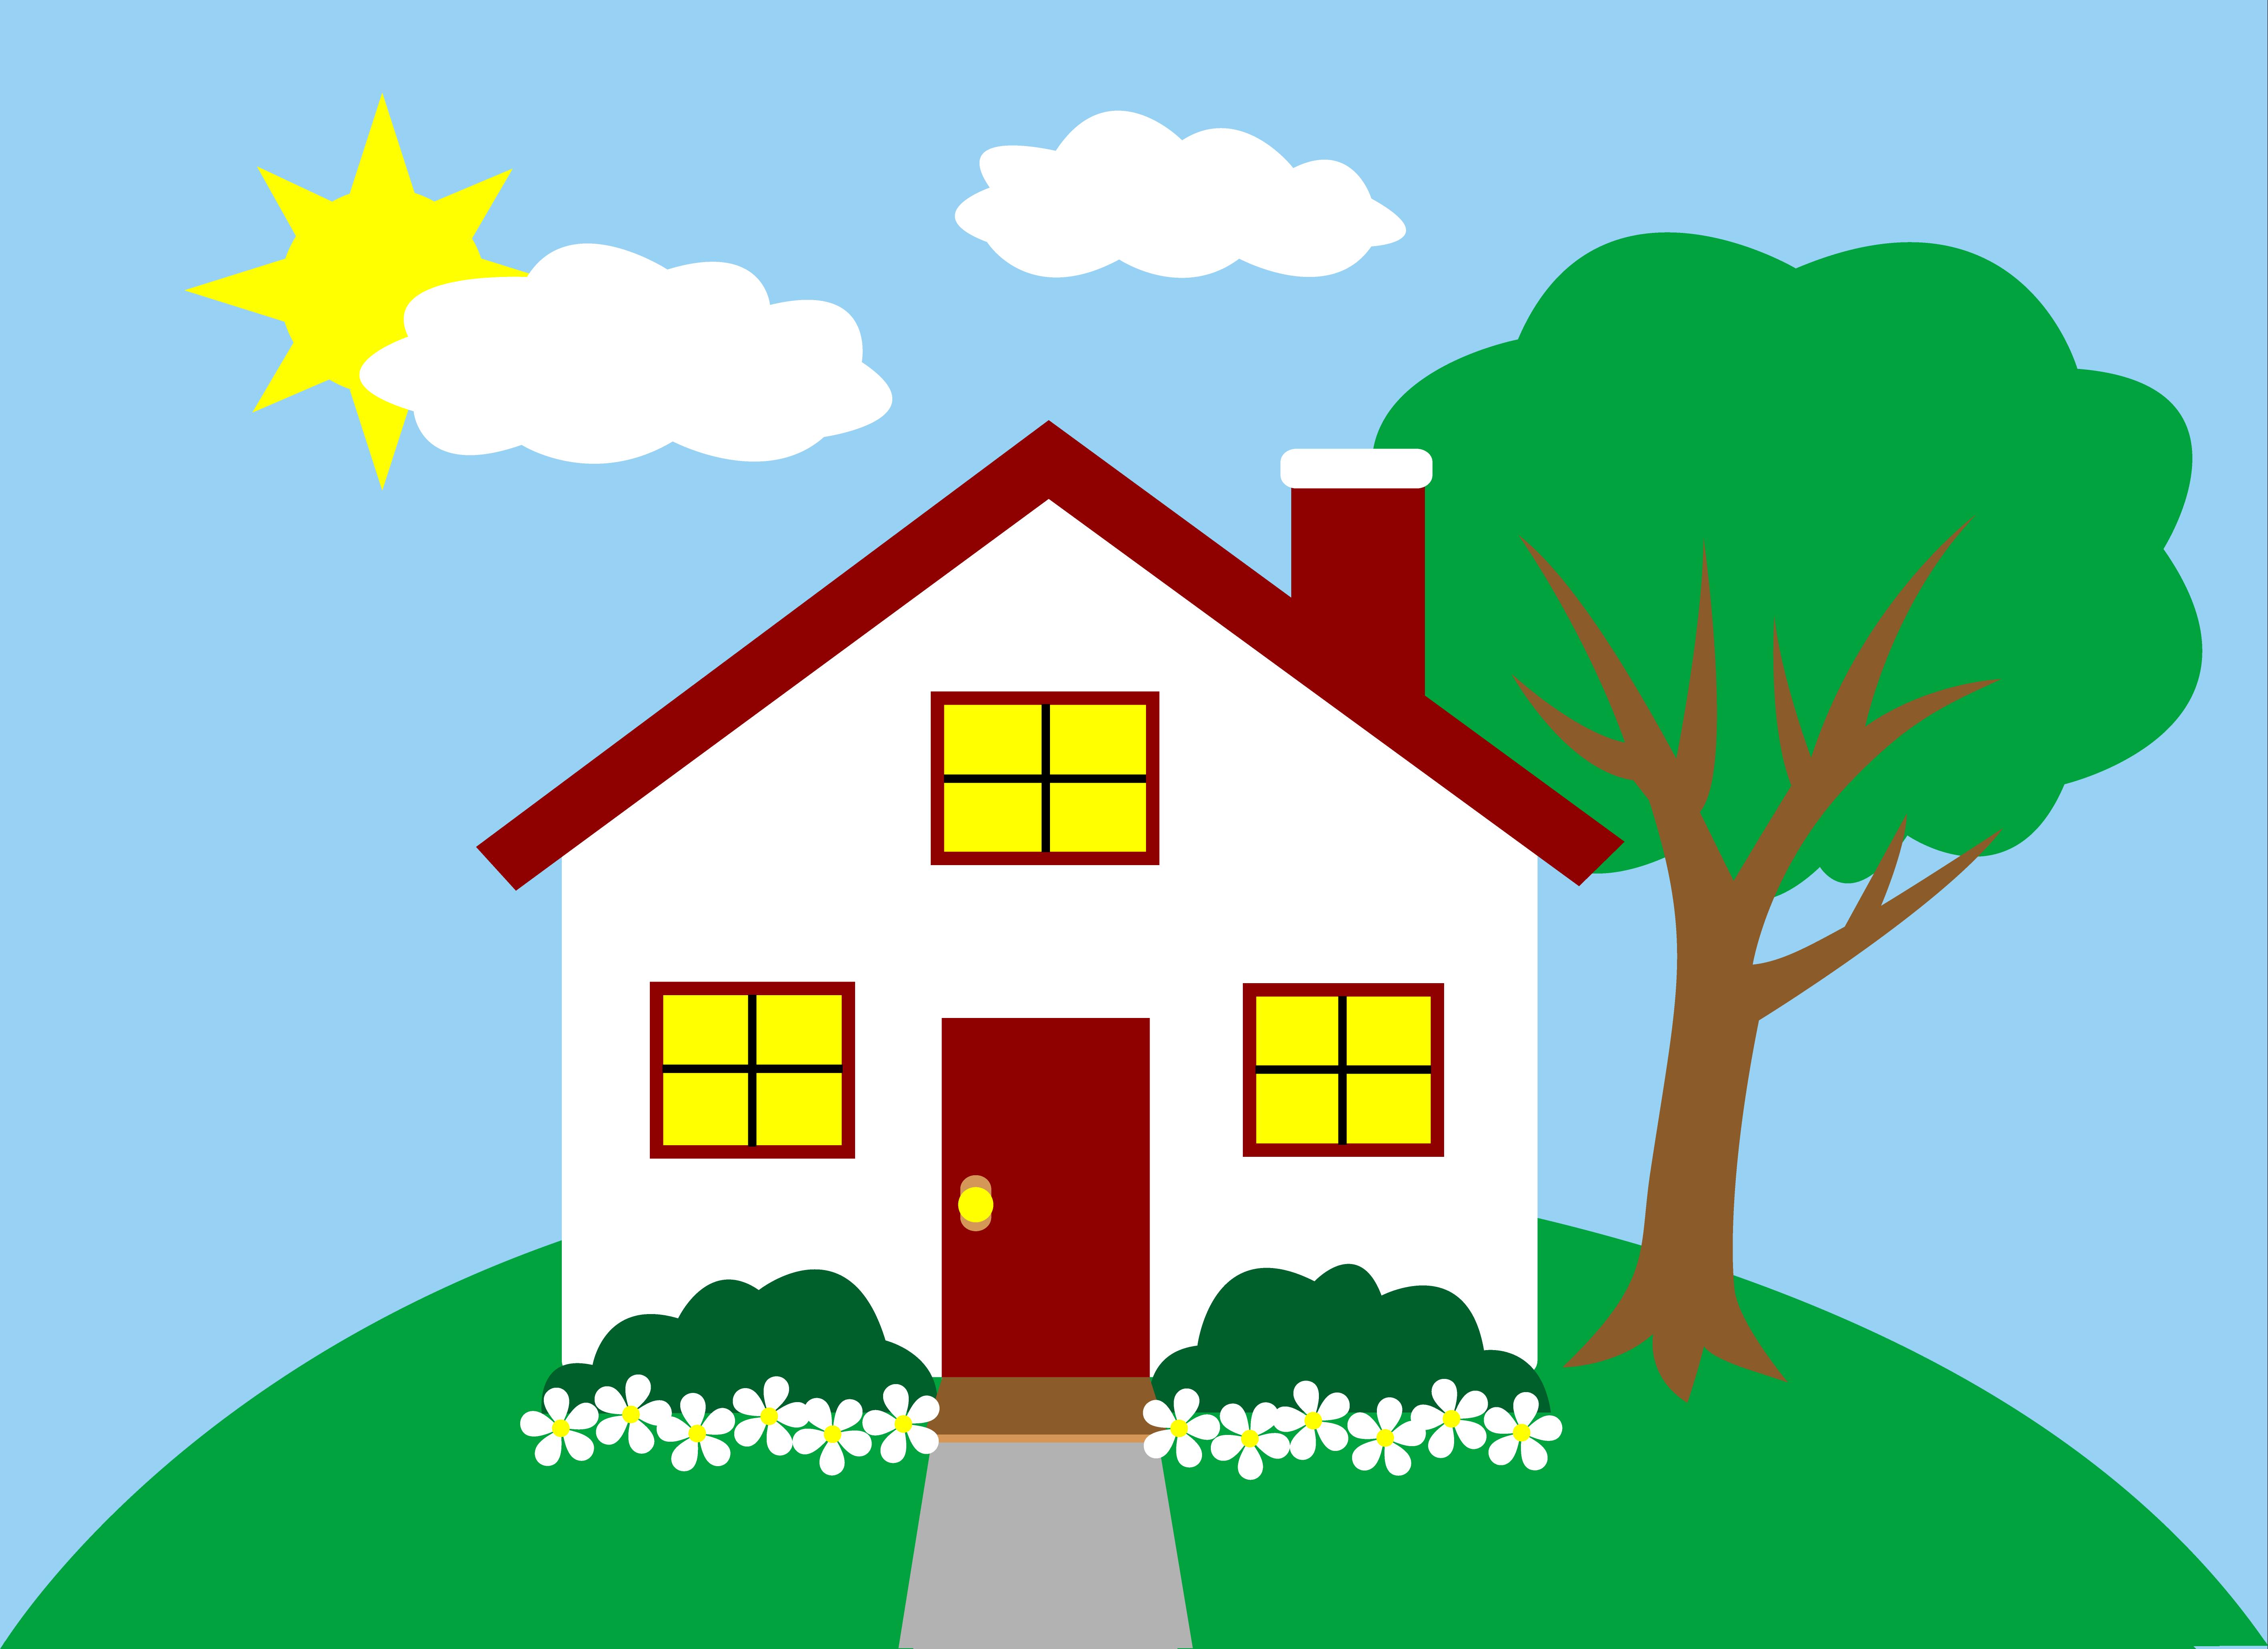 clipart house-clipart house-19